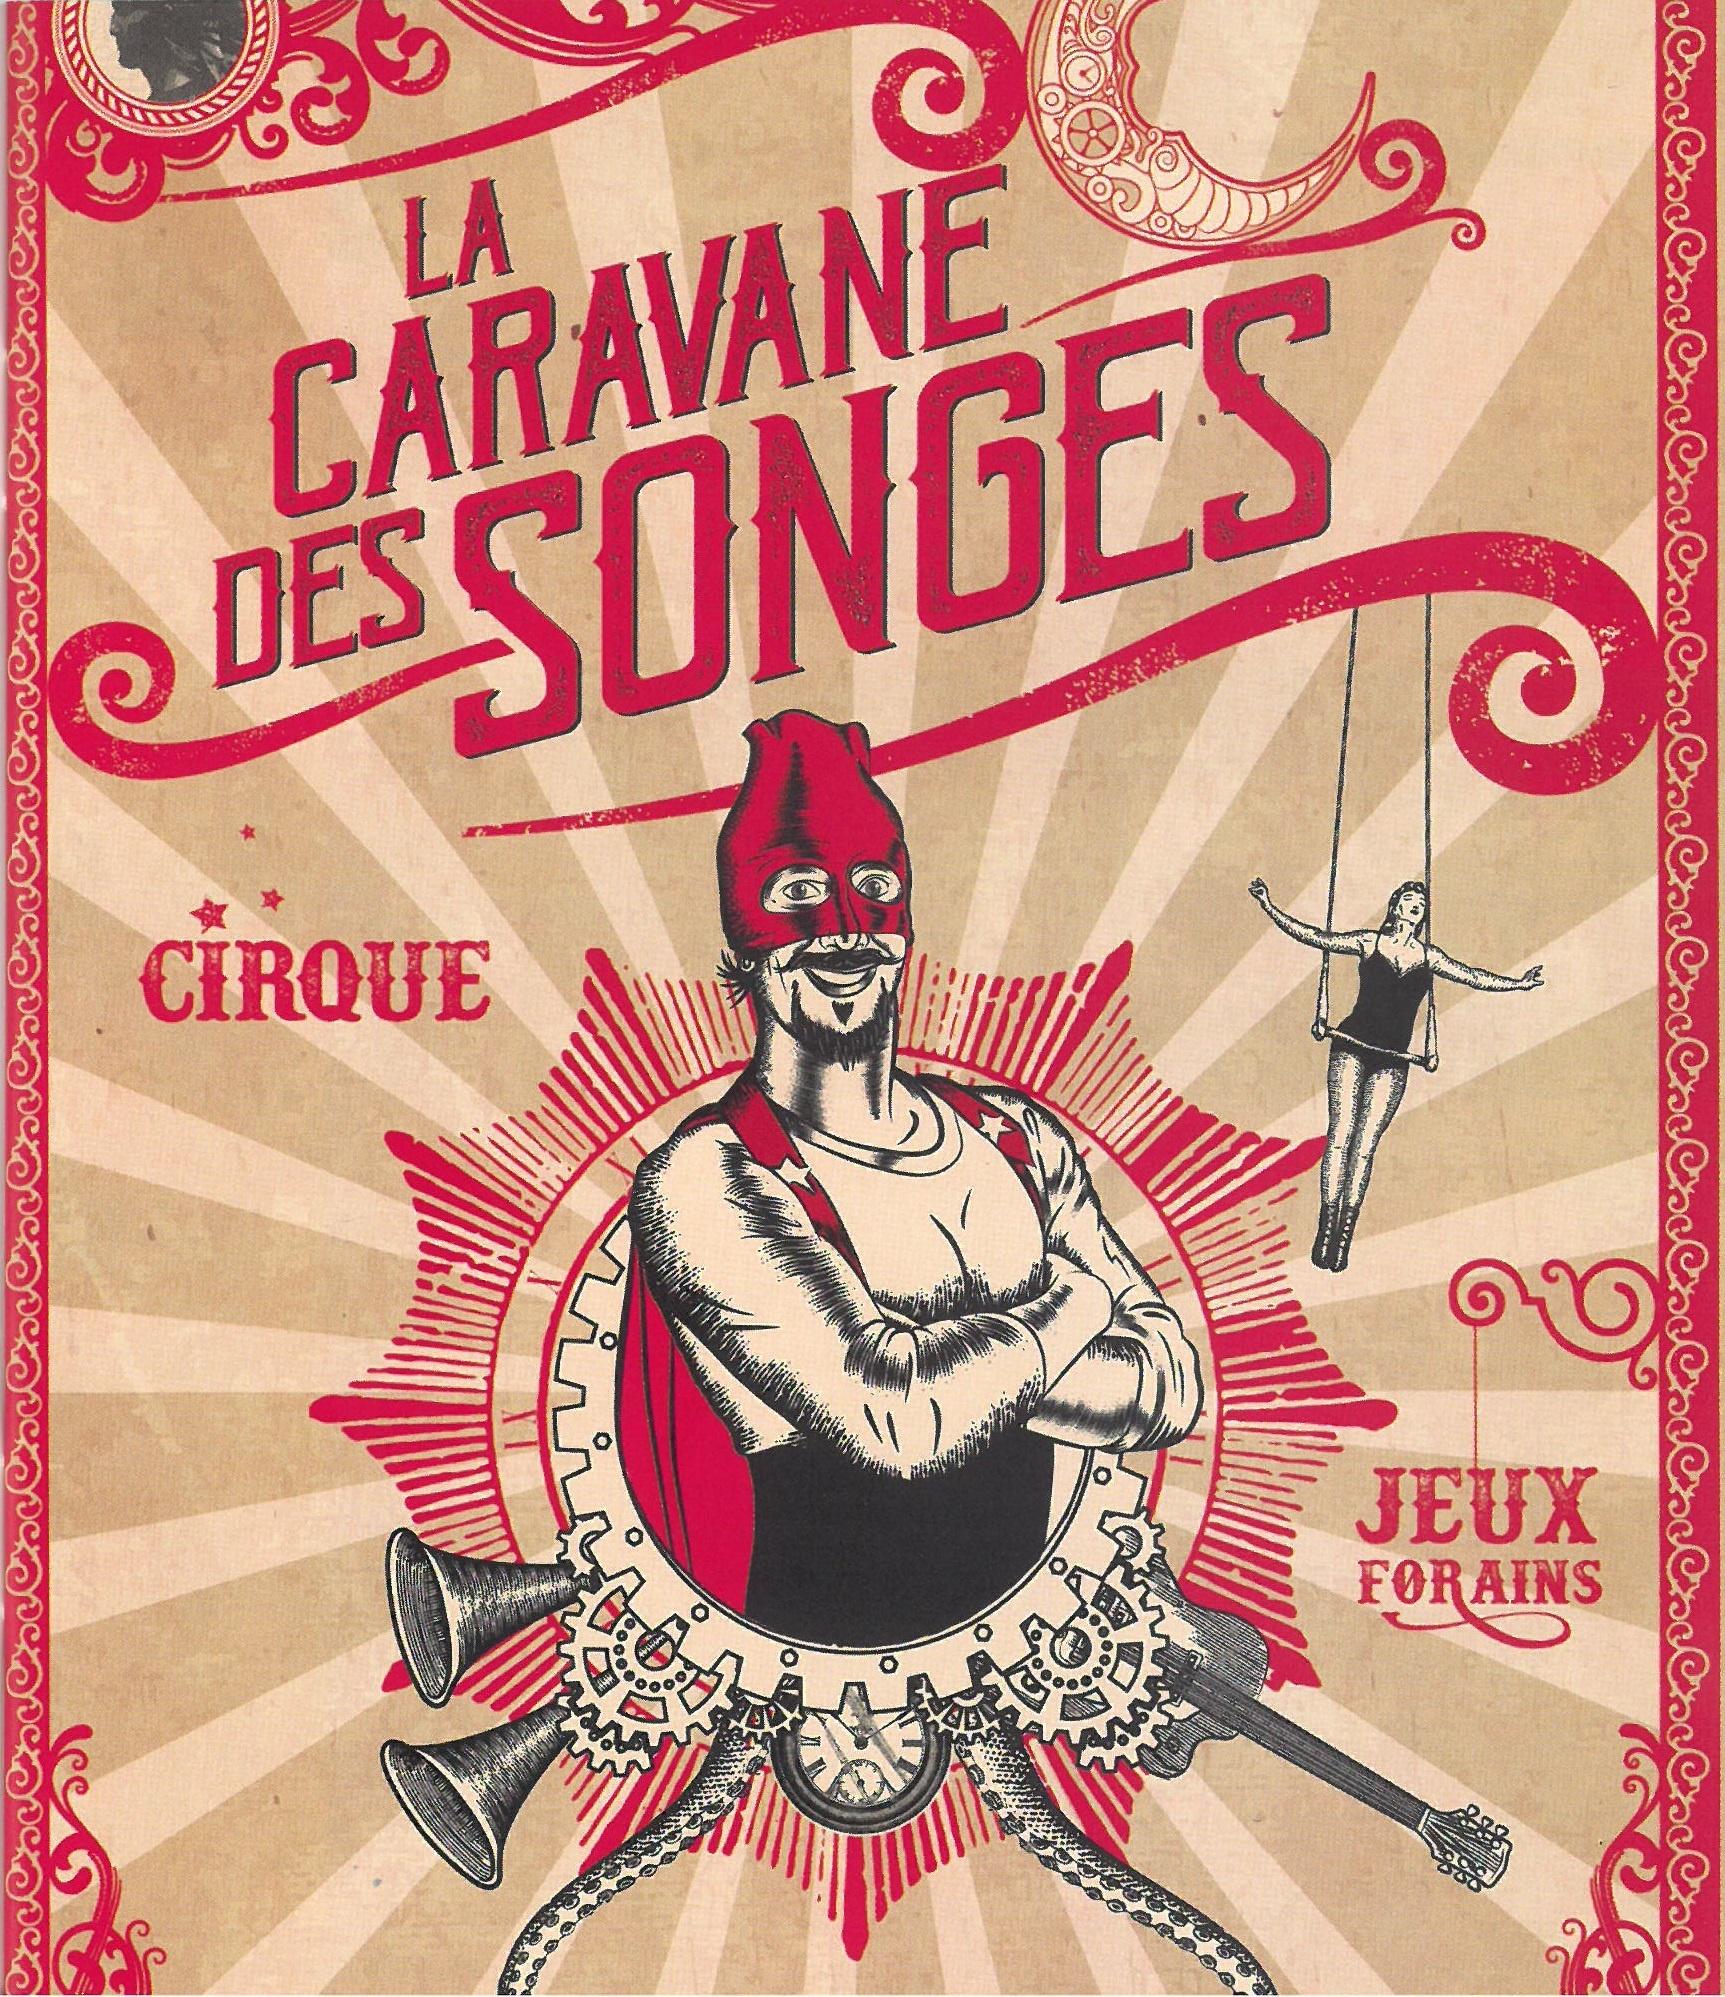 La Caravane des Songes par le cirque La Cabriole et la compagnie Alchymère